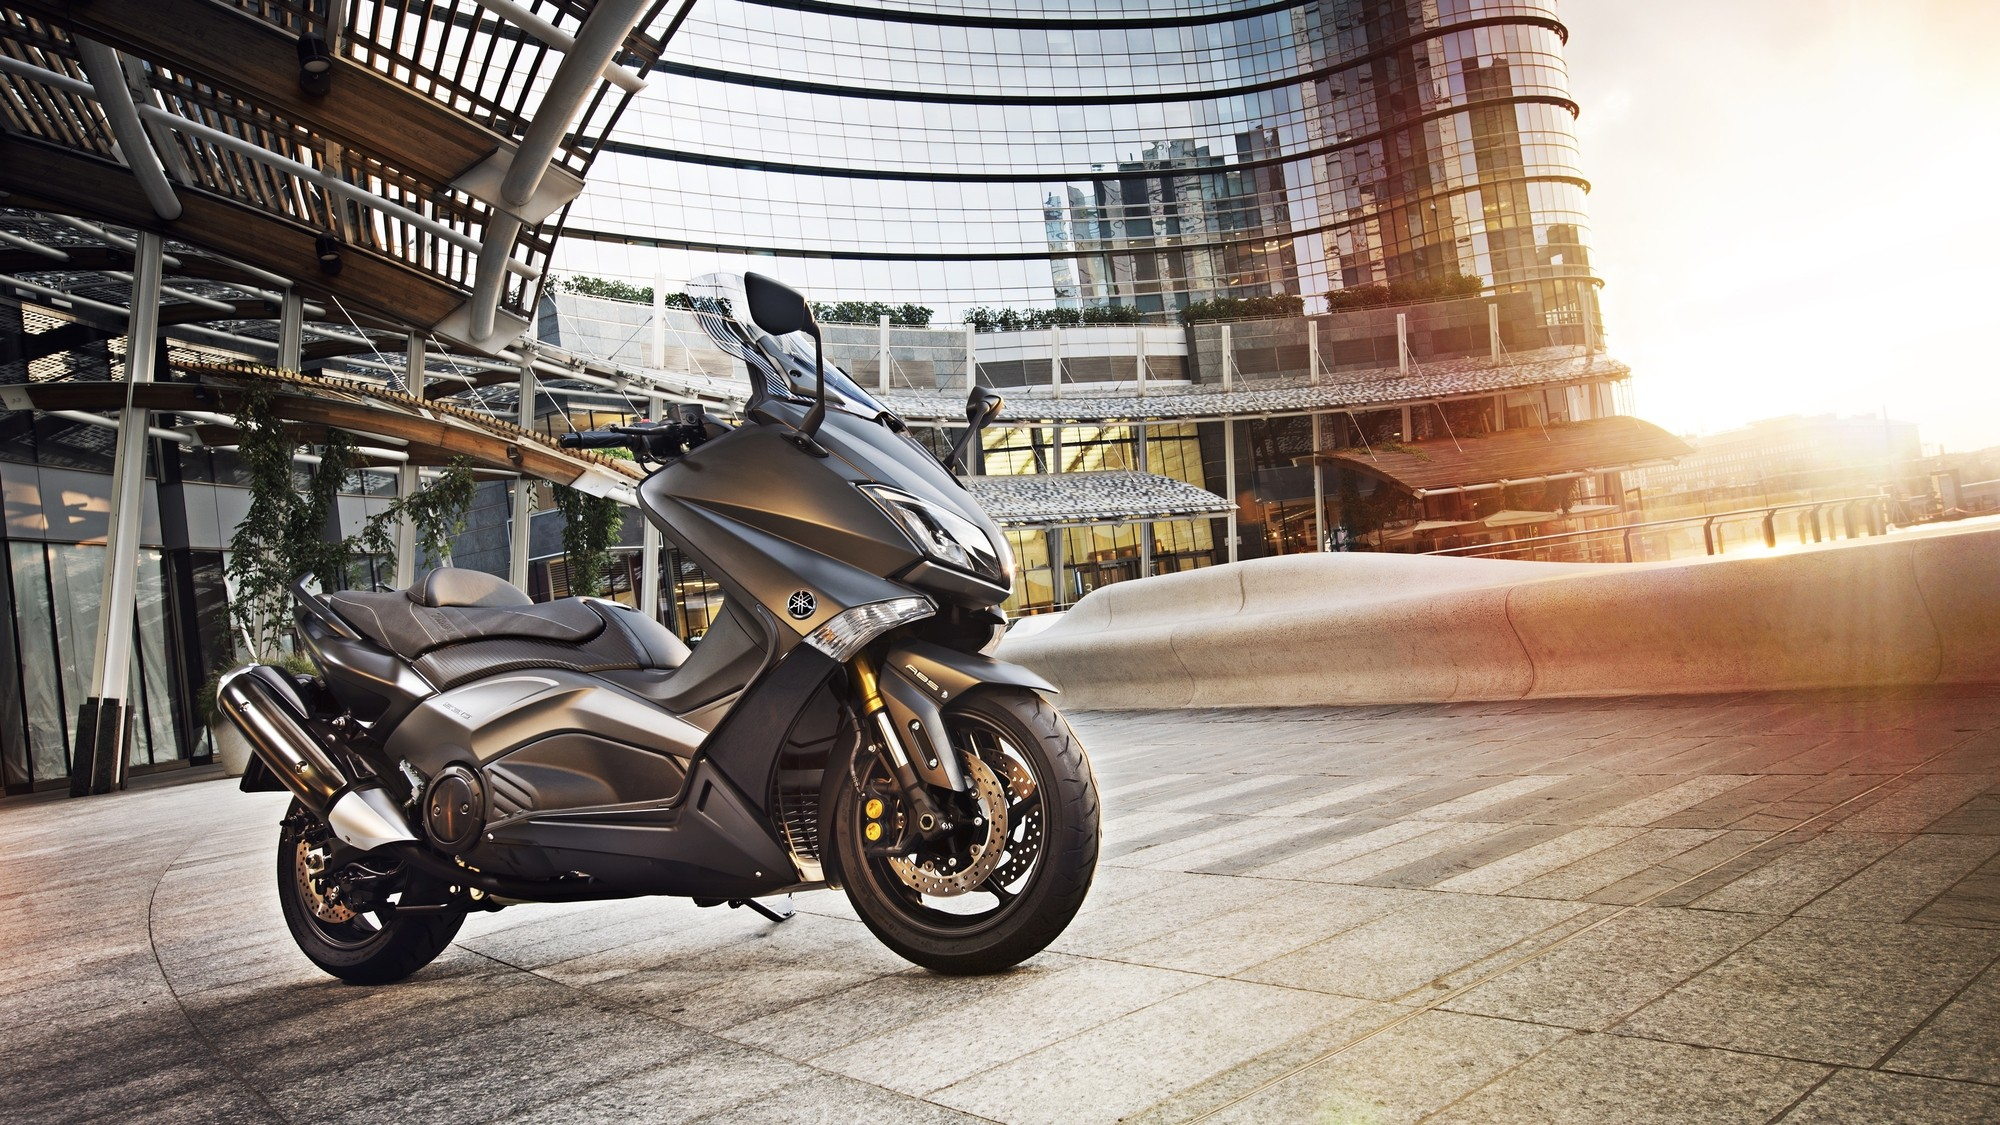 2015 Yamaha T Max Iron Max Looks Sharp And Evil